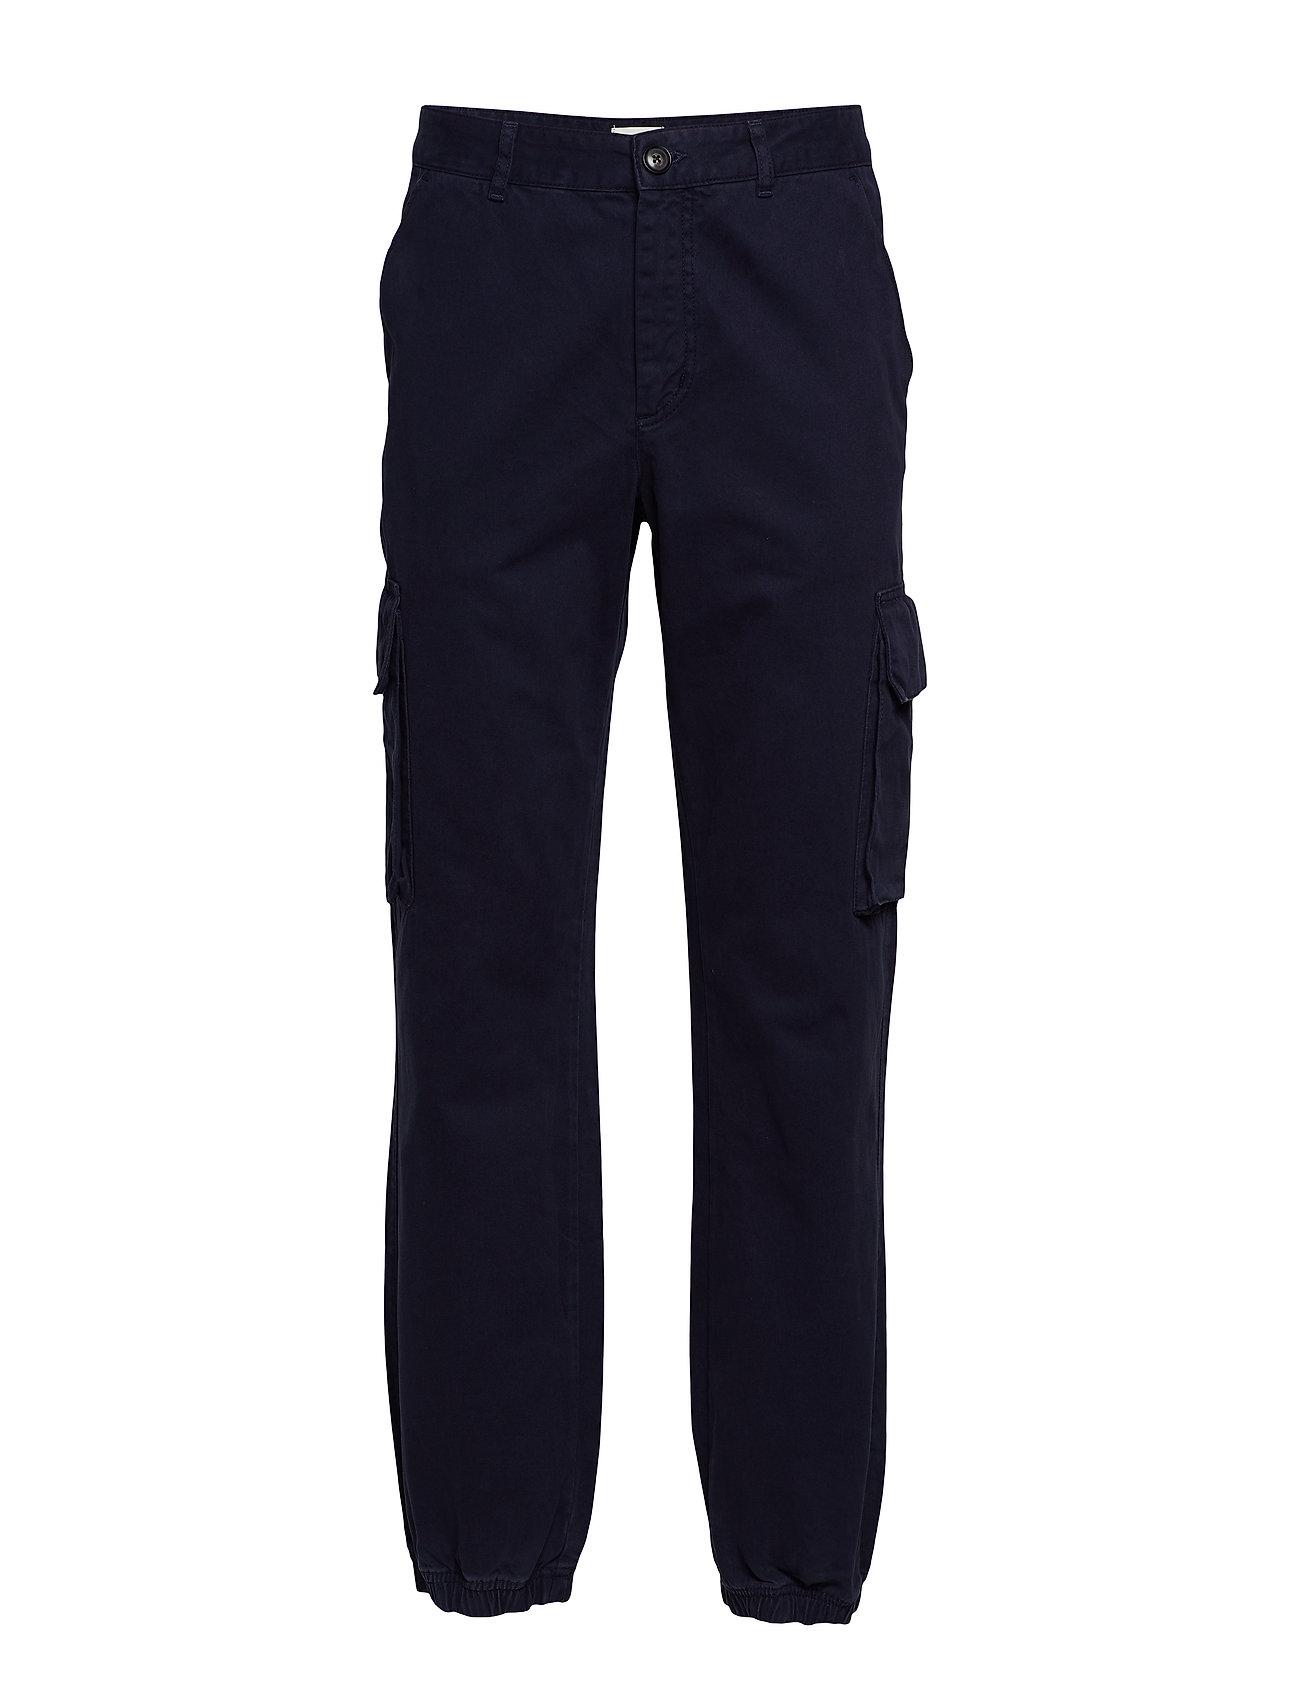 Wood Wood Eigil trousers - NAVY